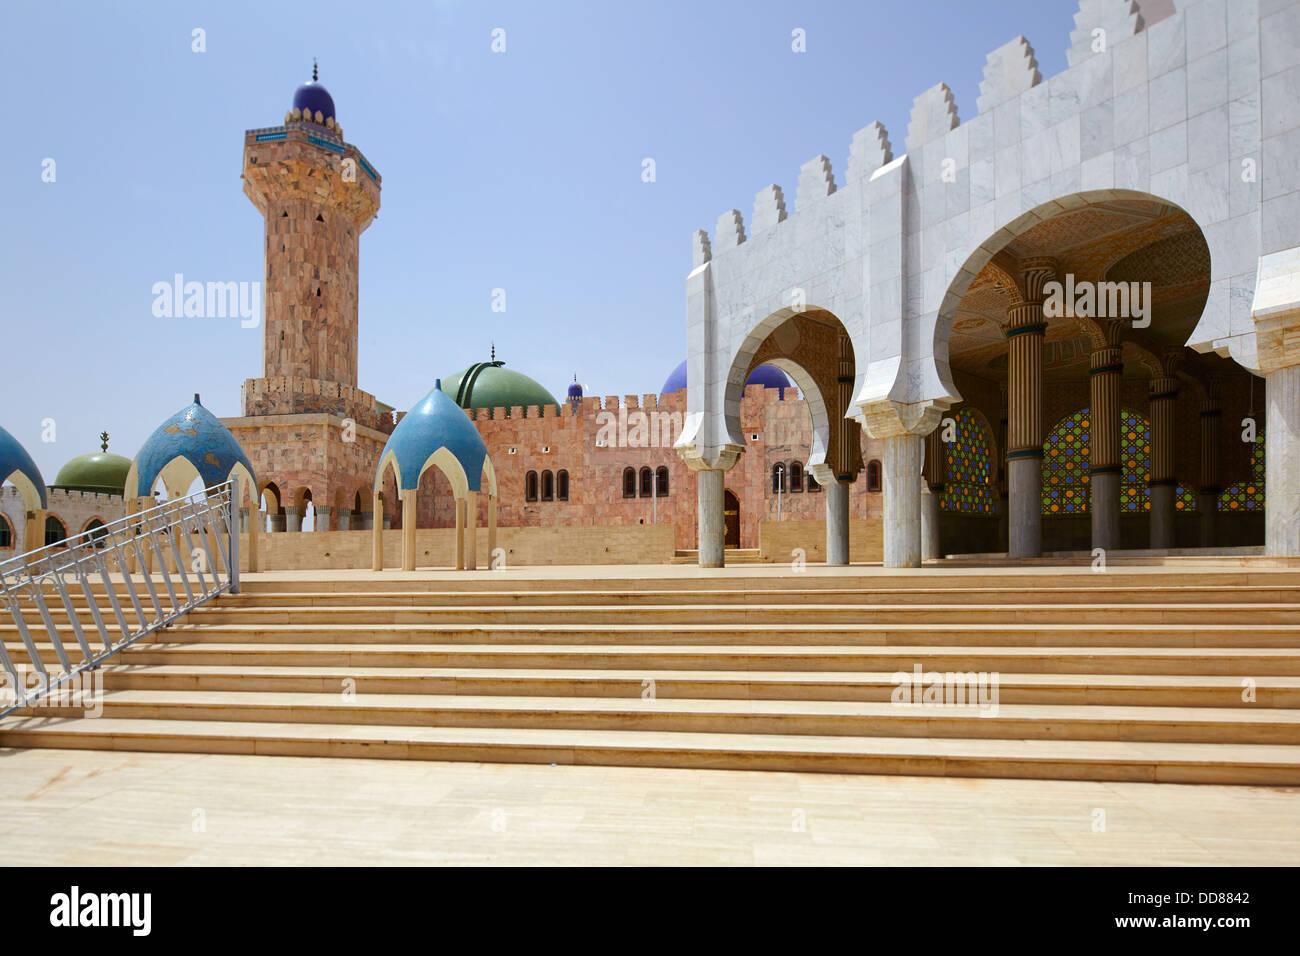 La Gran Mezquita de Touba, Senegal, África Imagen De Stock